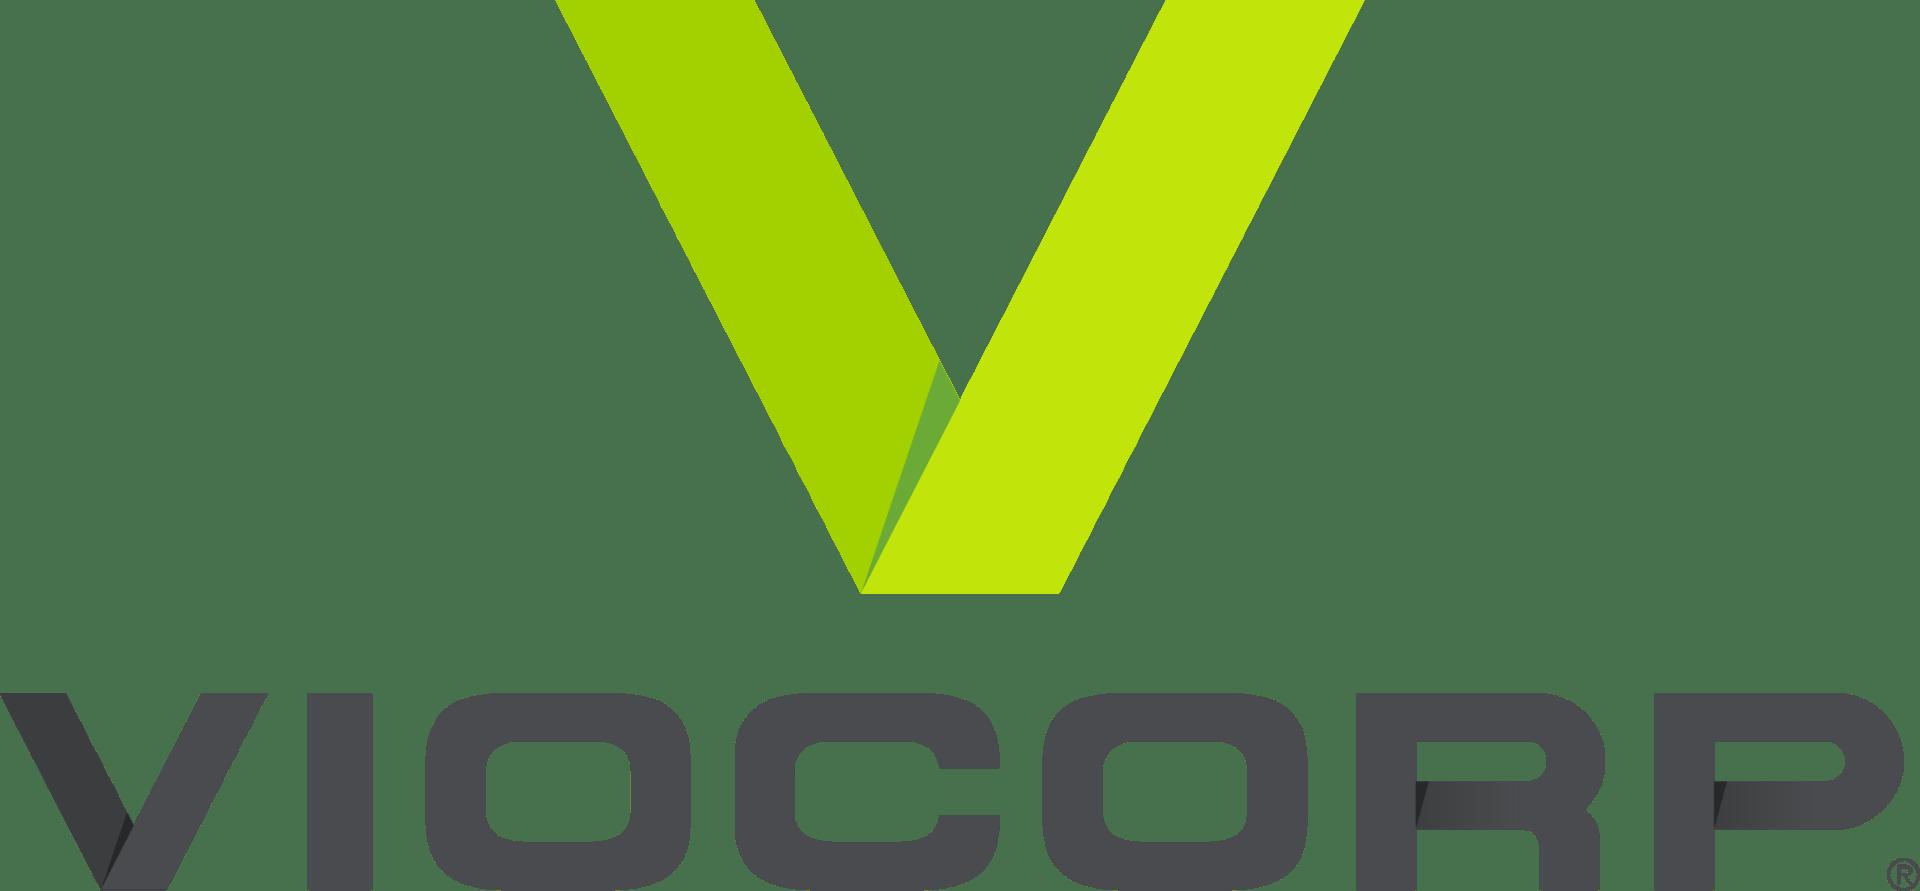 Viocorp logo